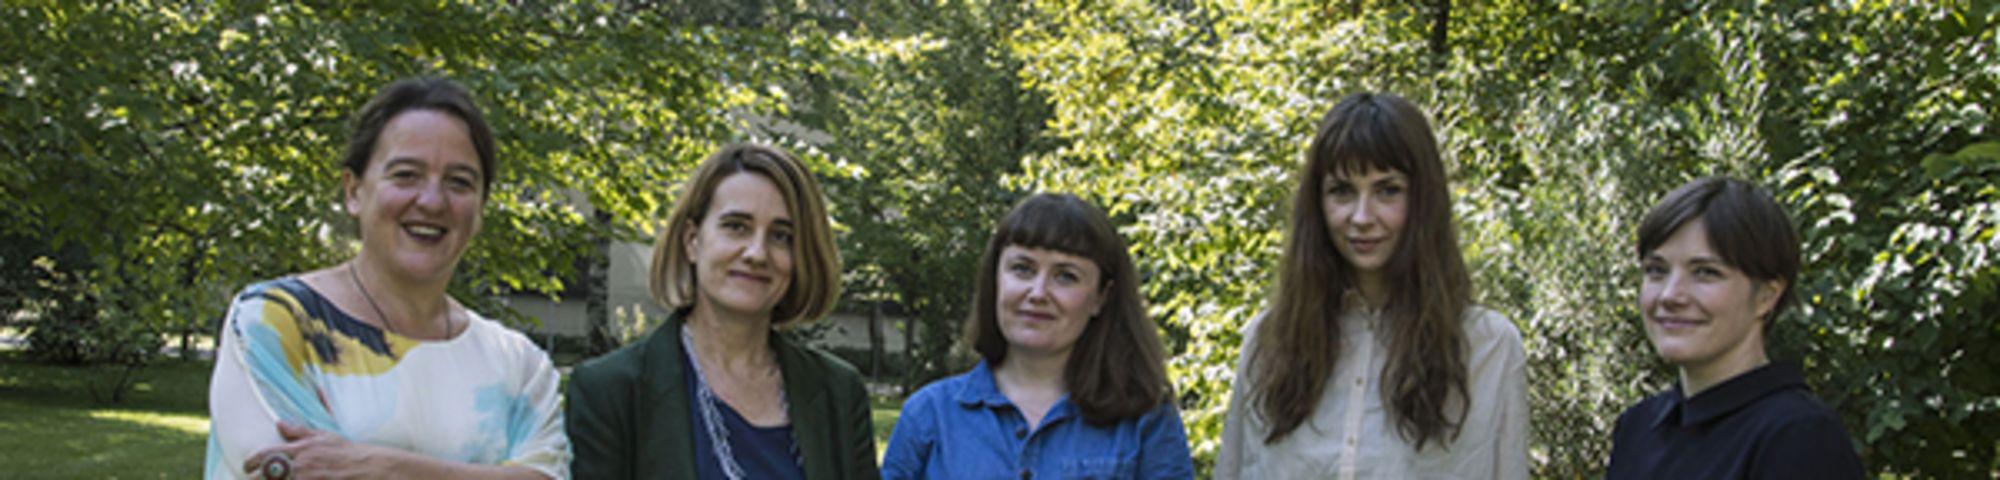 Max Mara Art Prize for Women  Tania Kovats, Ana Génoves, Ruth Ewan, Phoebe Unwin, Emma Hart. Photo – Gabriele Micalizzi Cesura. Courtesy Collezione Maramotti